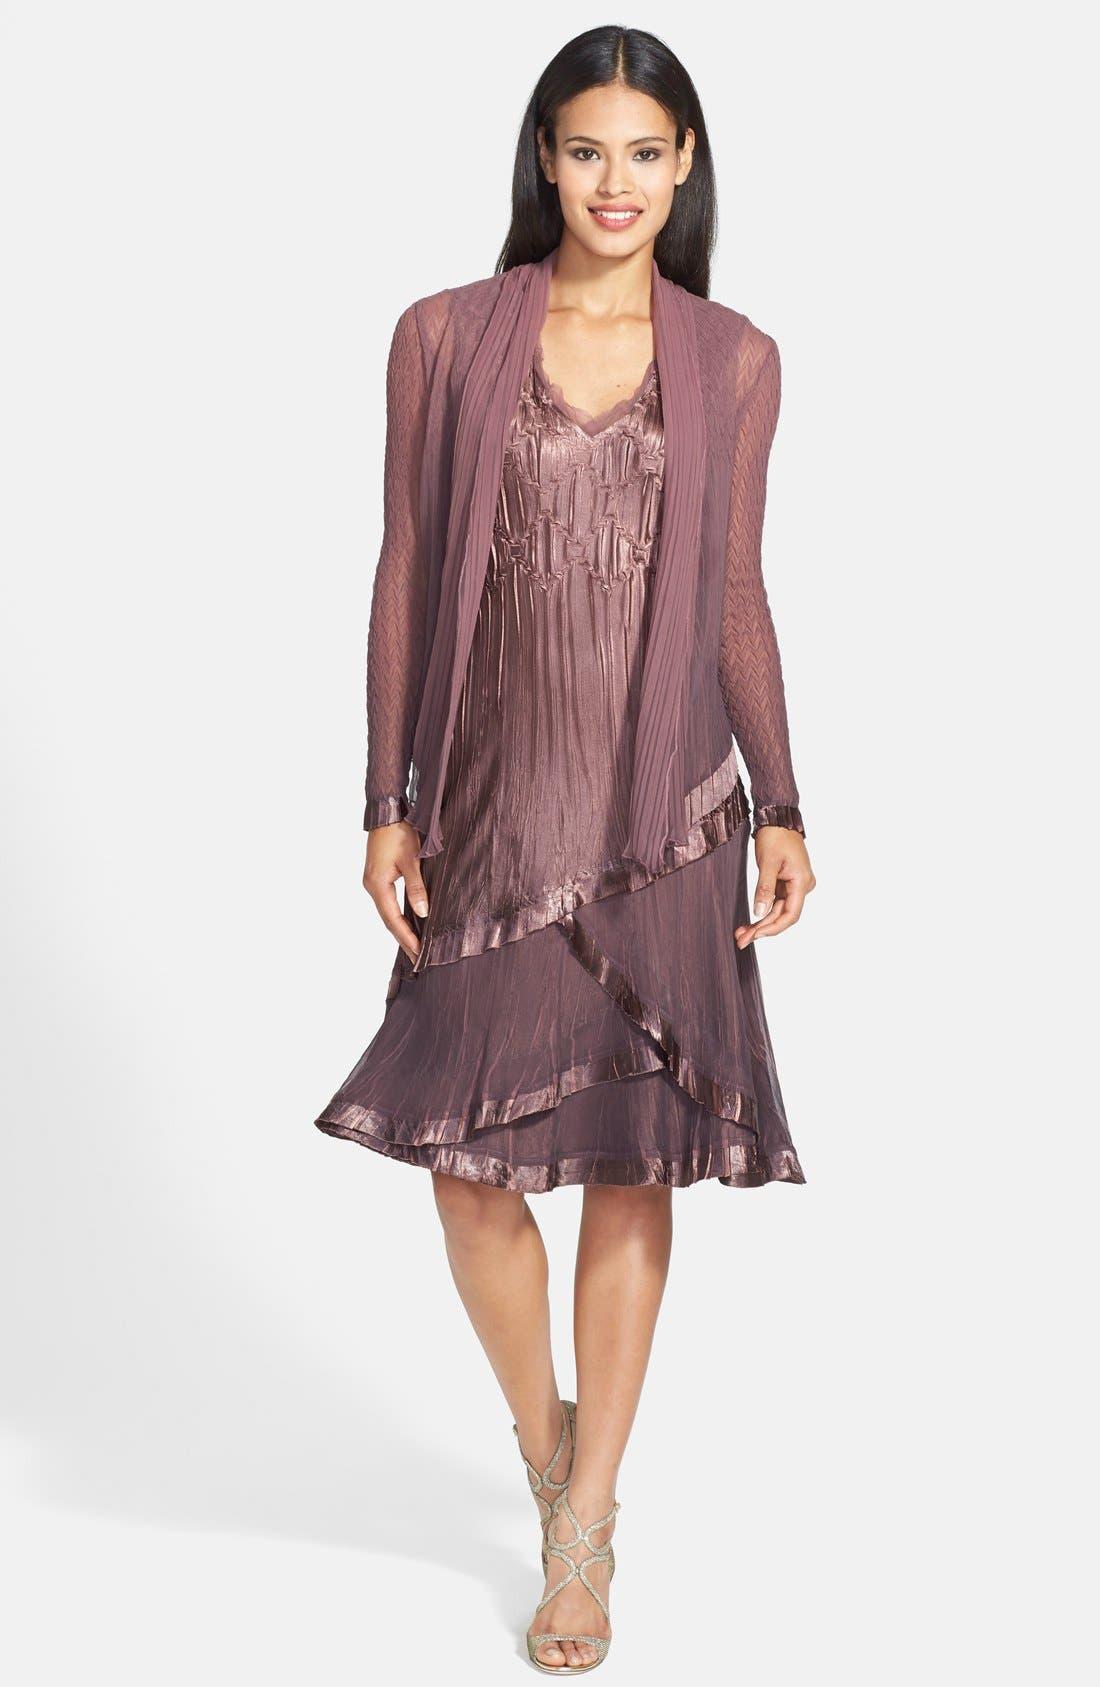 Alternate Image 1 Selected - Komarov Charmeuse A-Line Dress & Chiffon Jacket